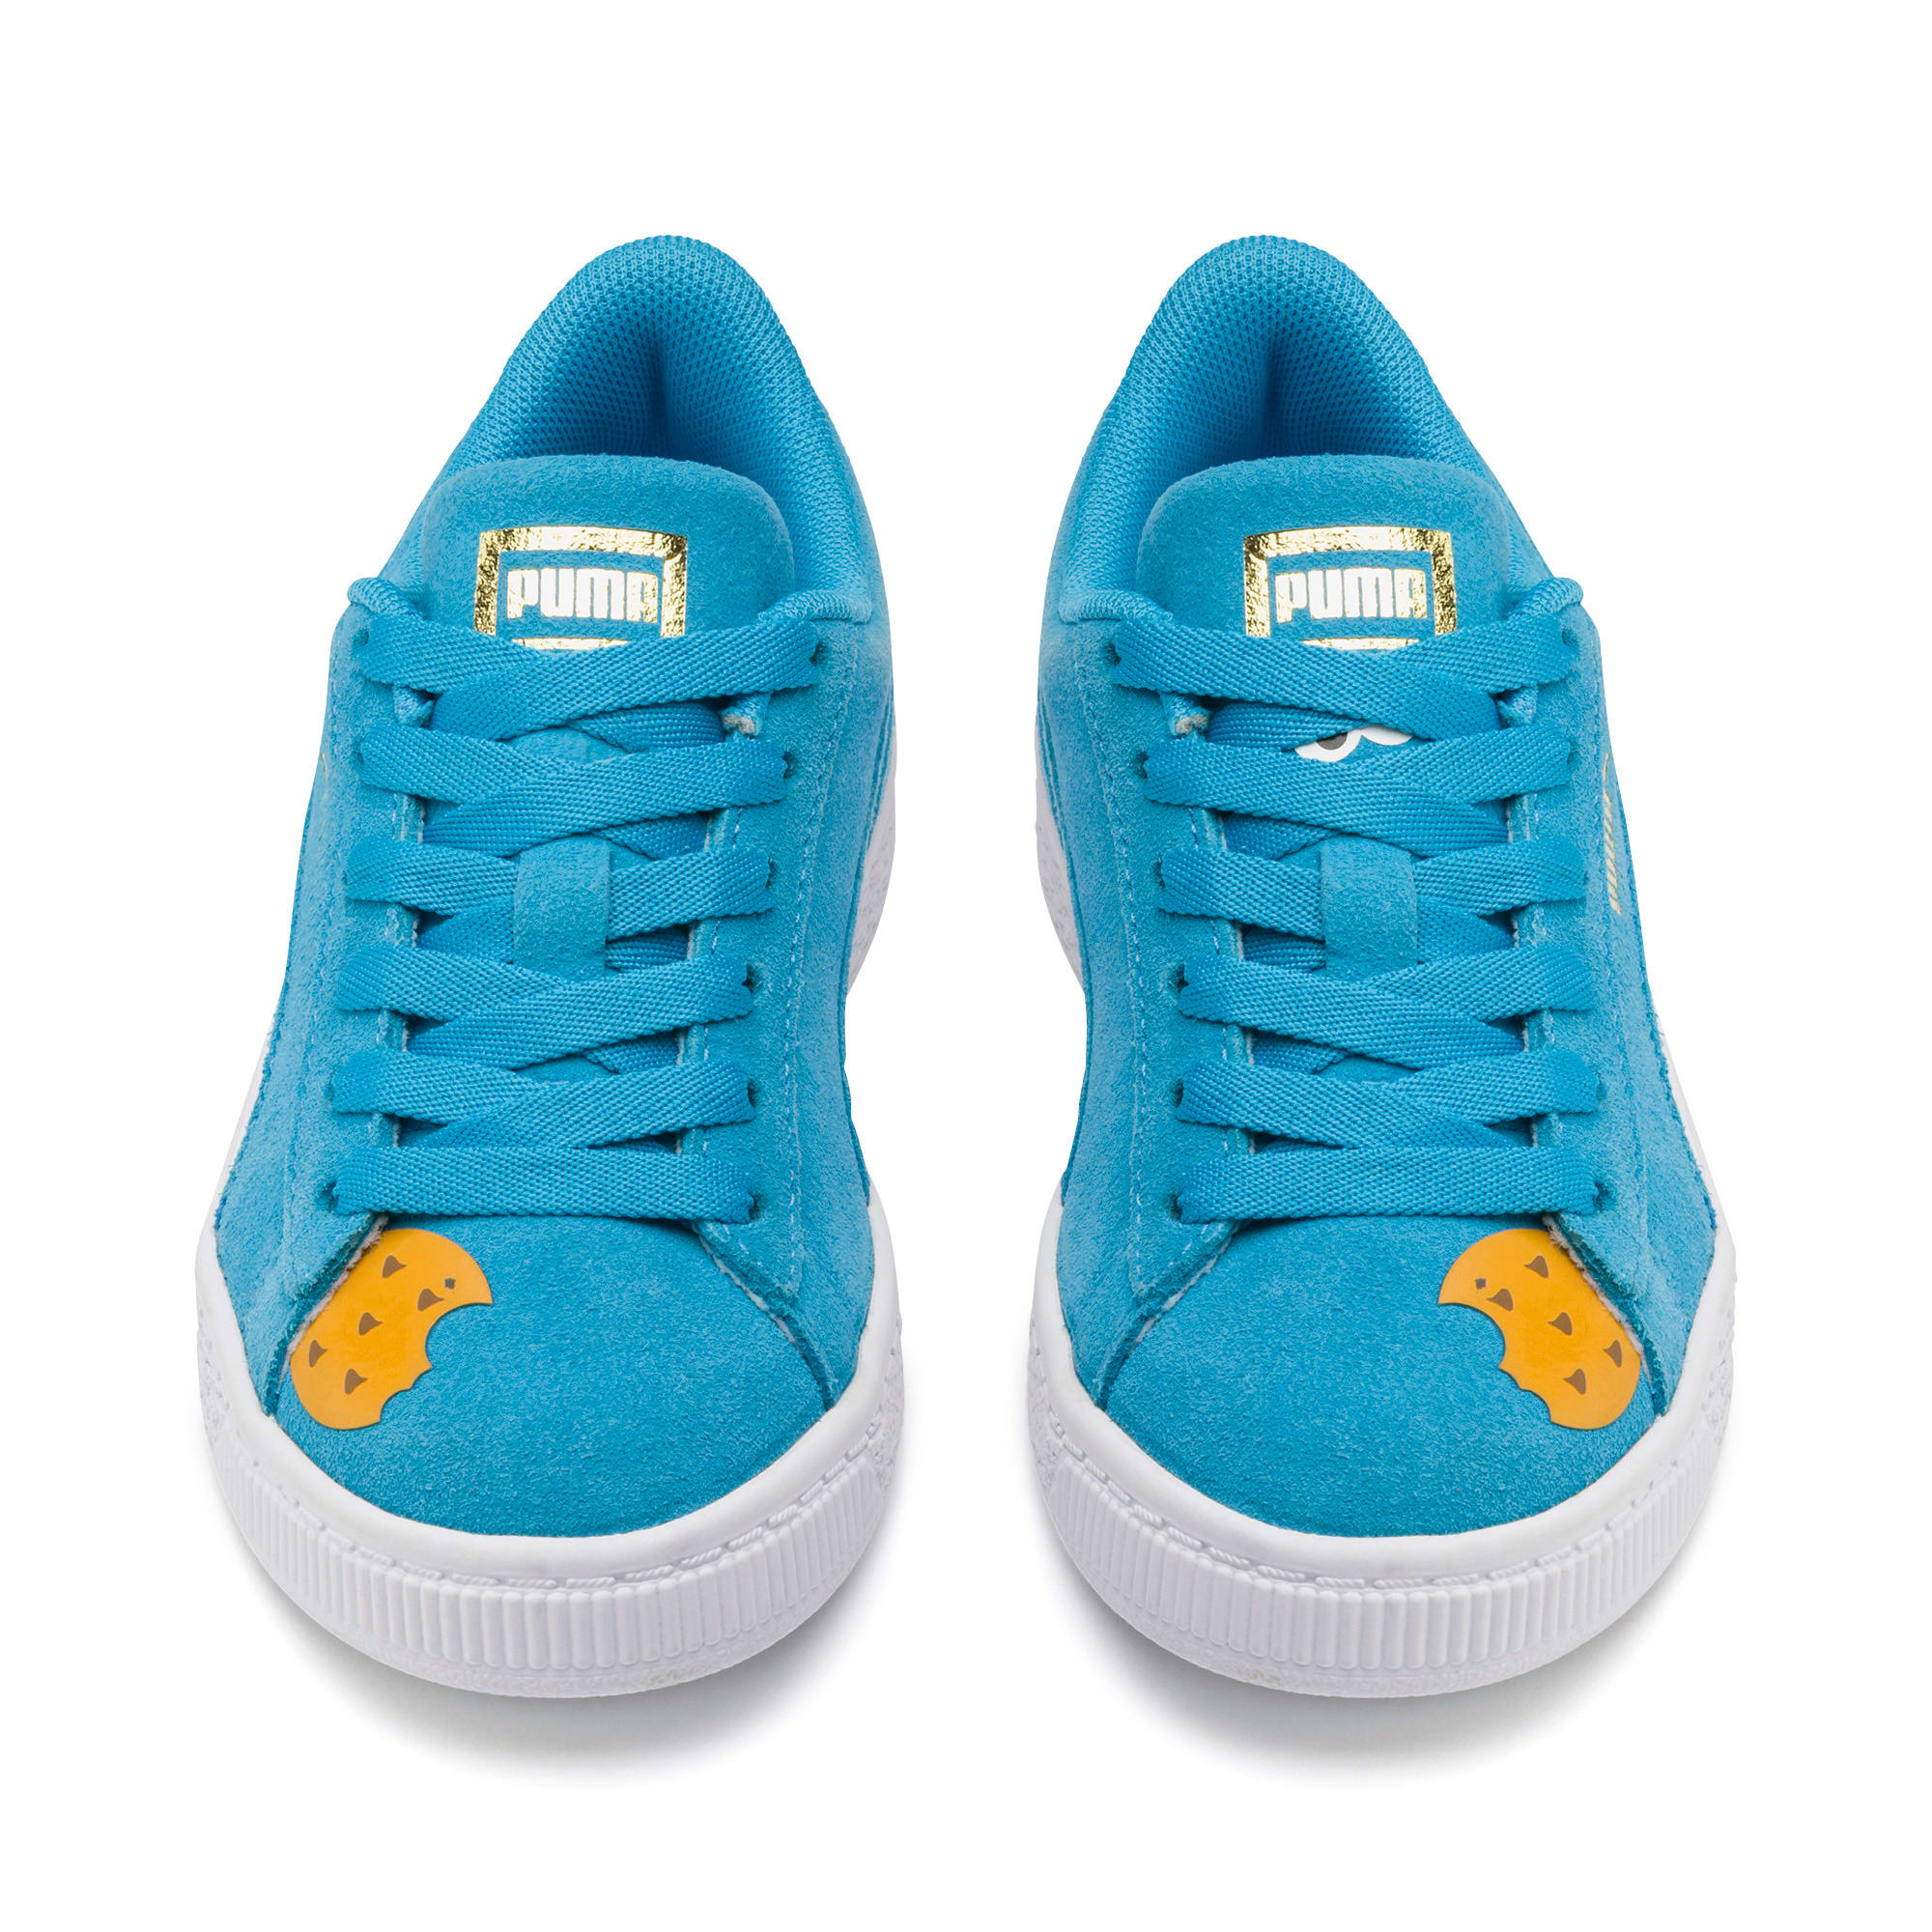 Thumbnail 7 of Sesamstraße 50 Suede Statement Kids Sneaker, Bleu Azur-Puma White, medium